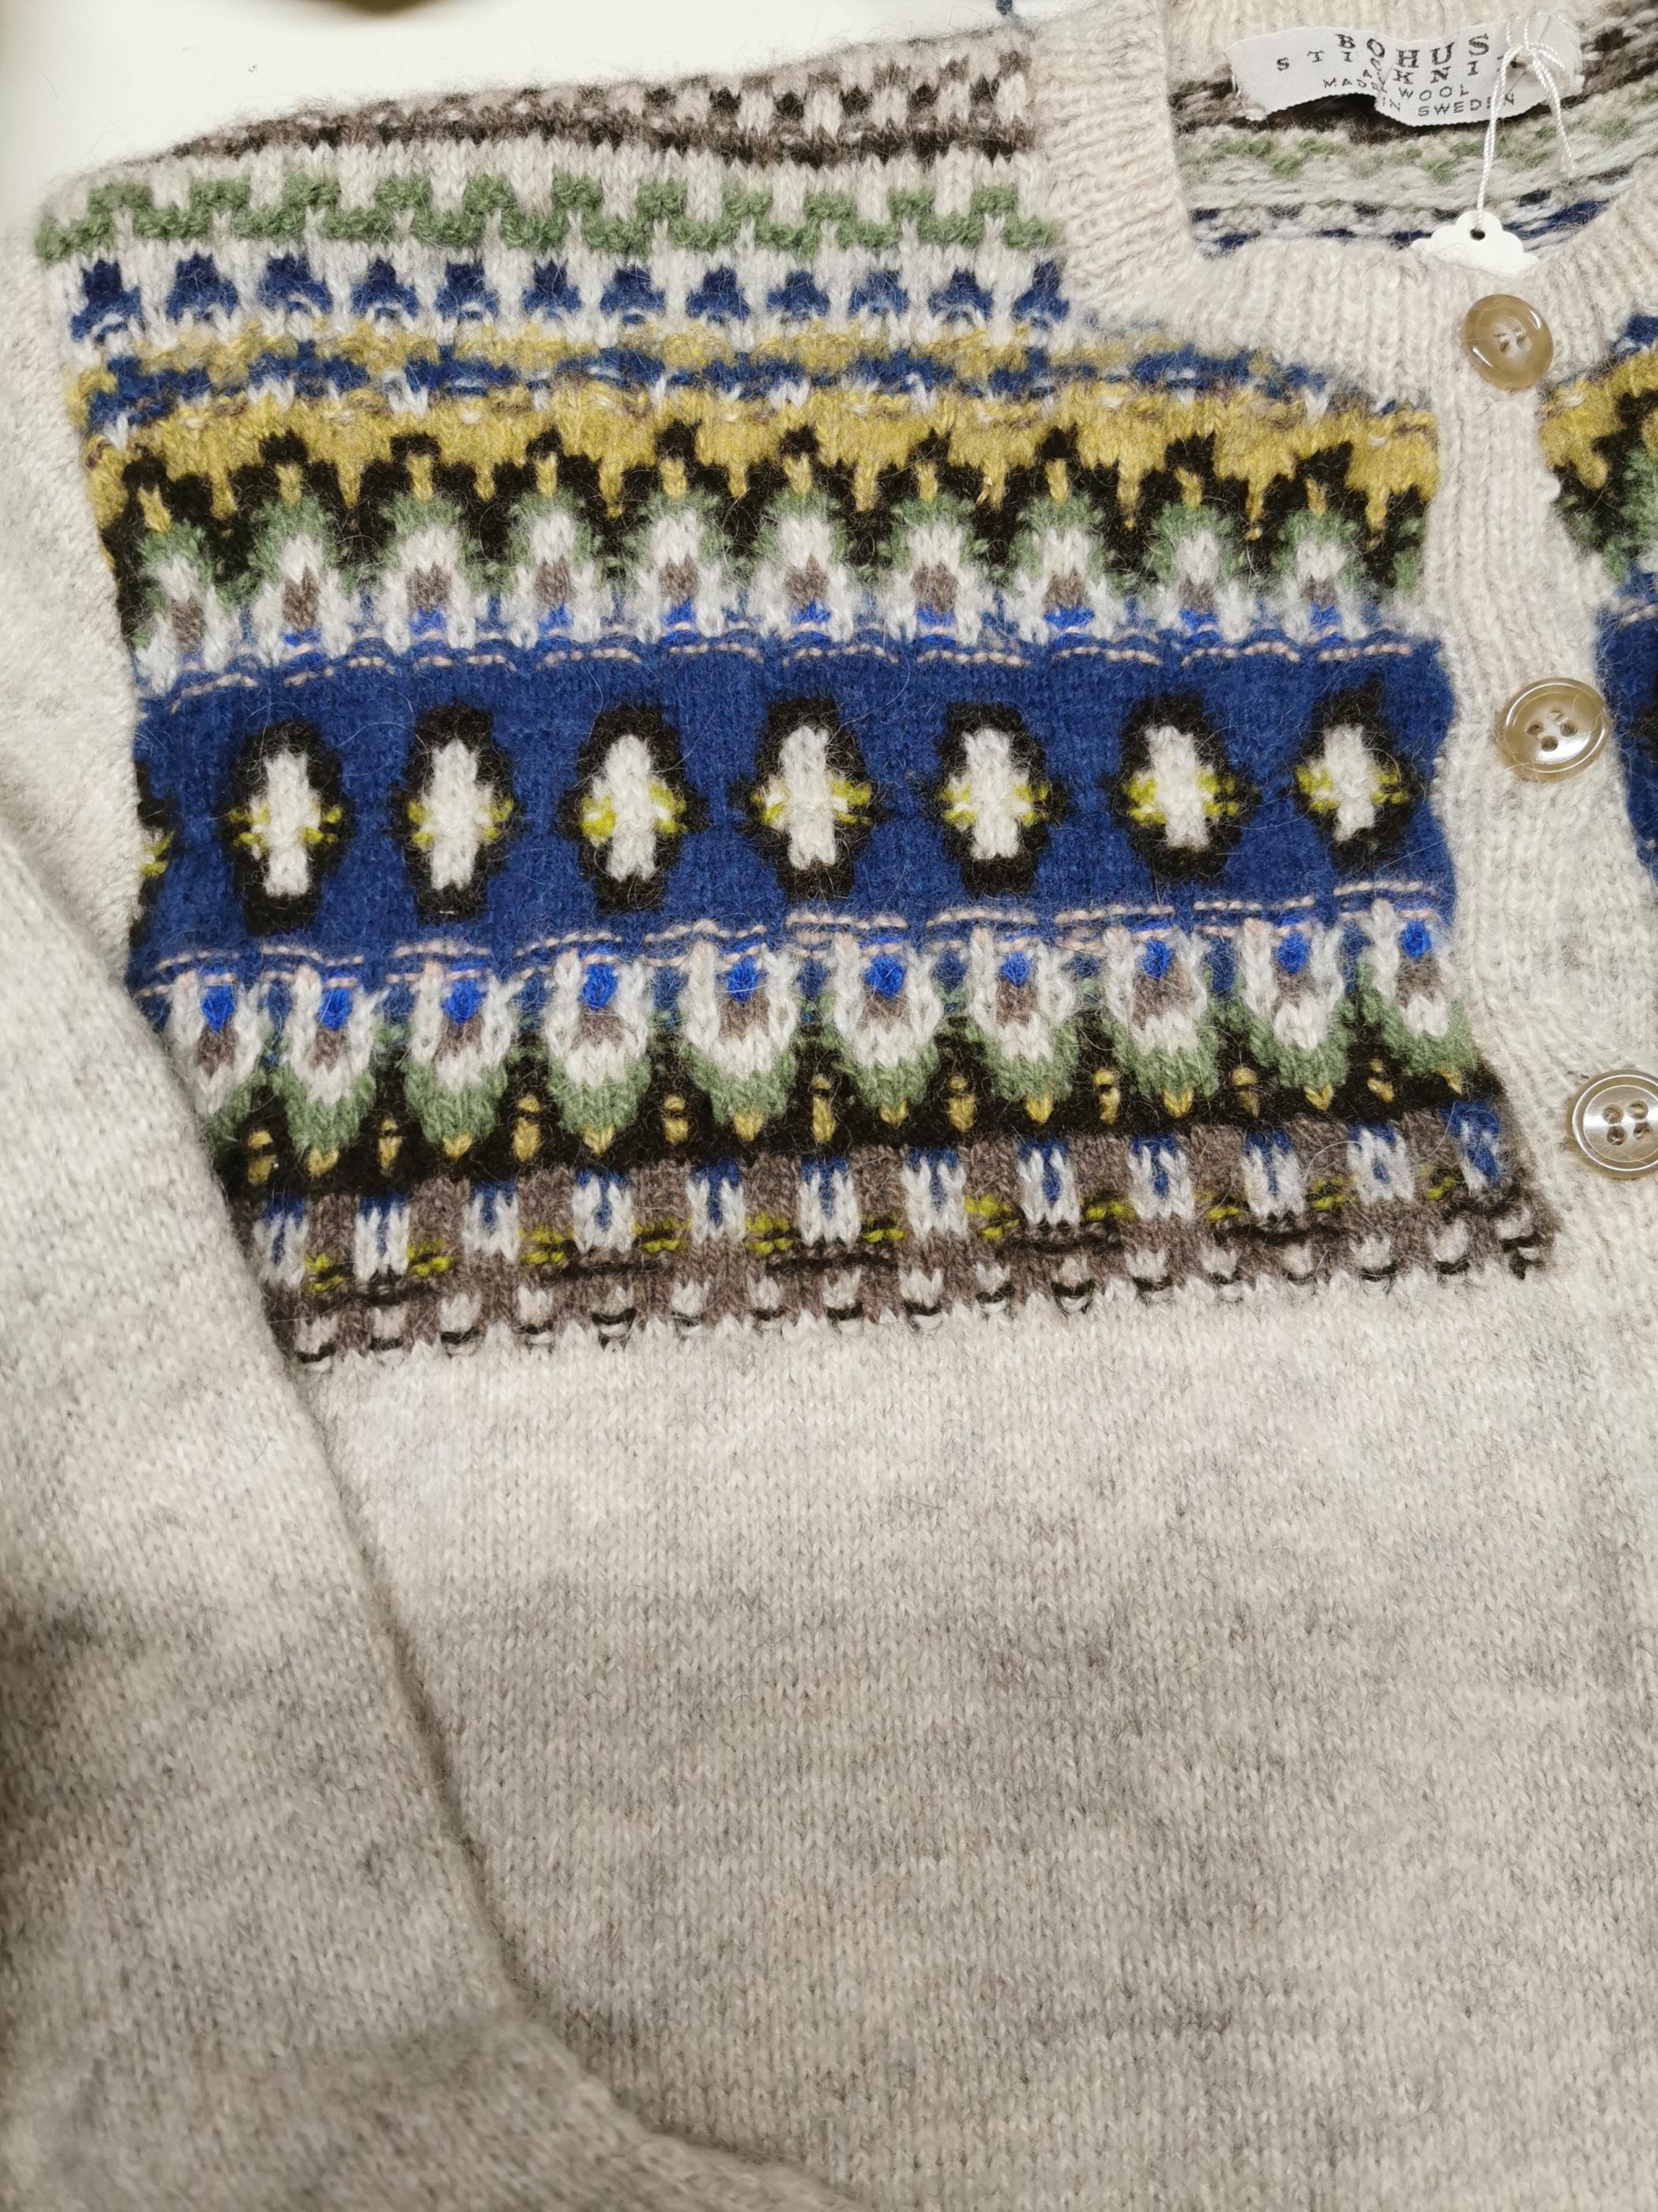 Bohus Stickning Blue Eskimo straight yoke pullover cardigan kit